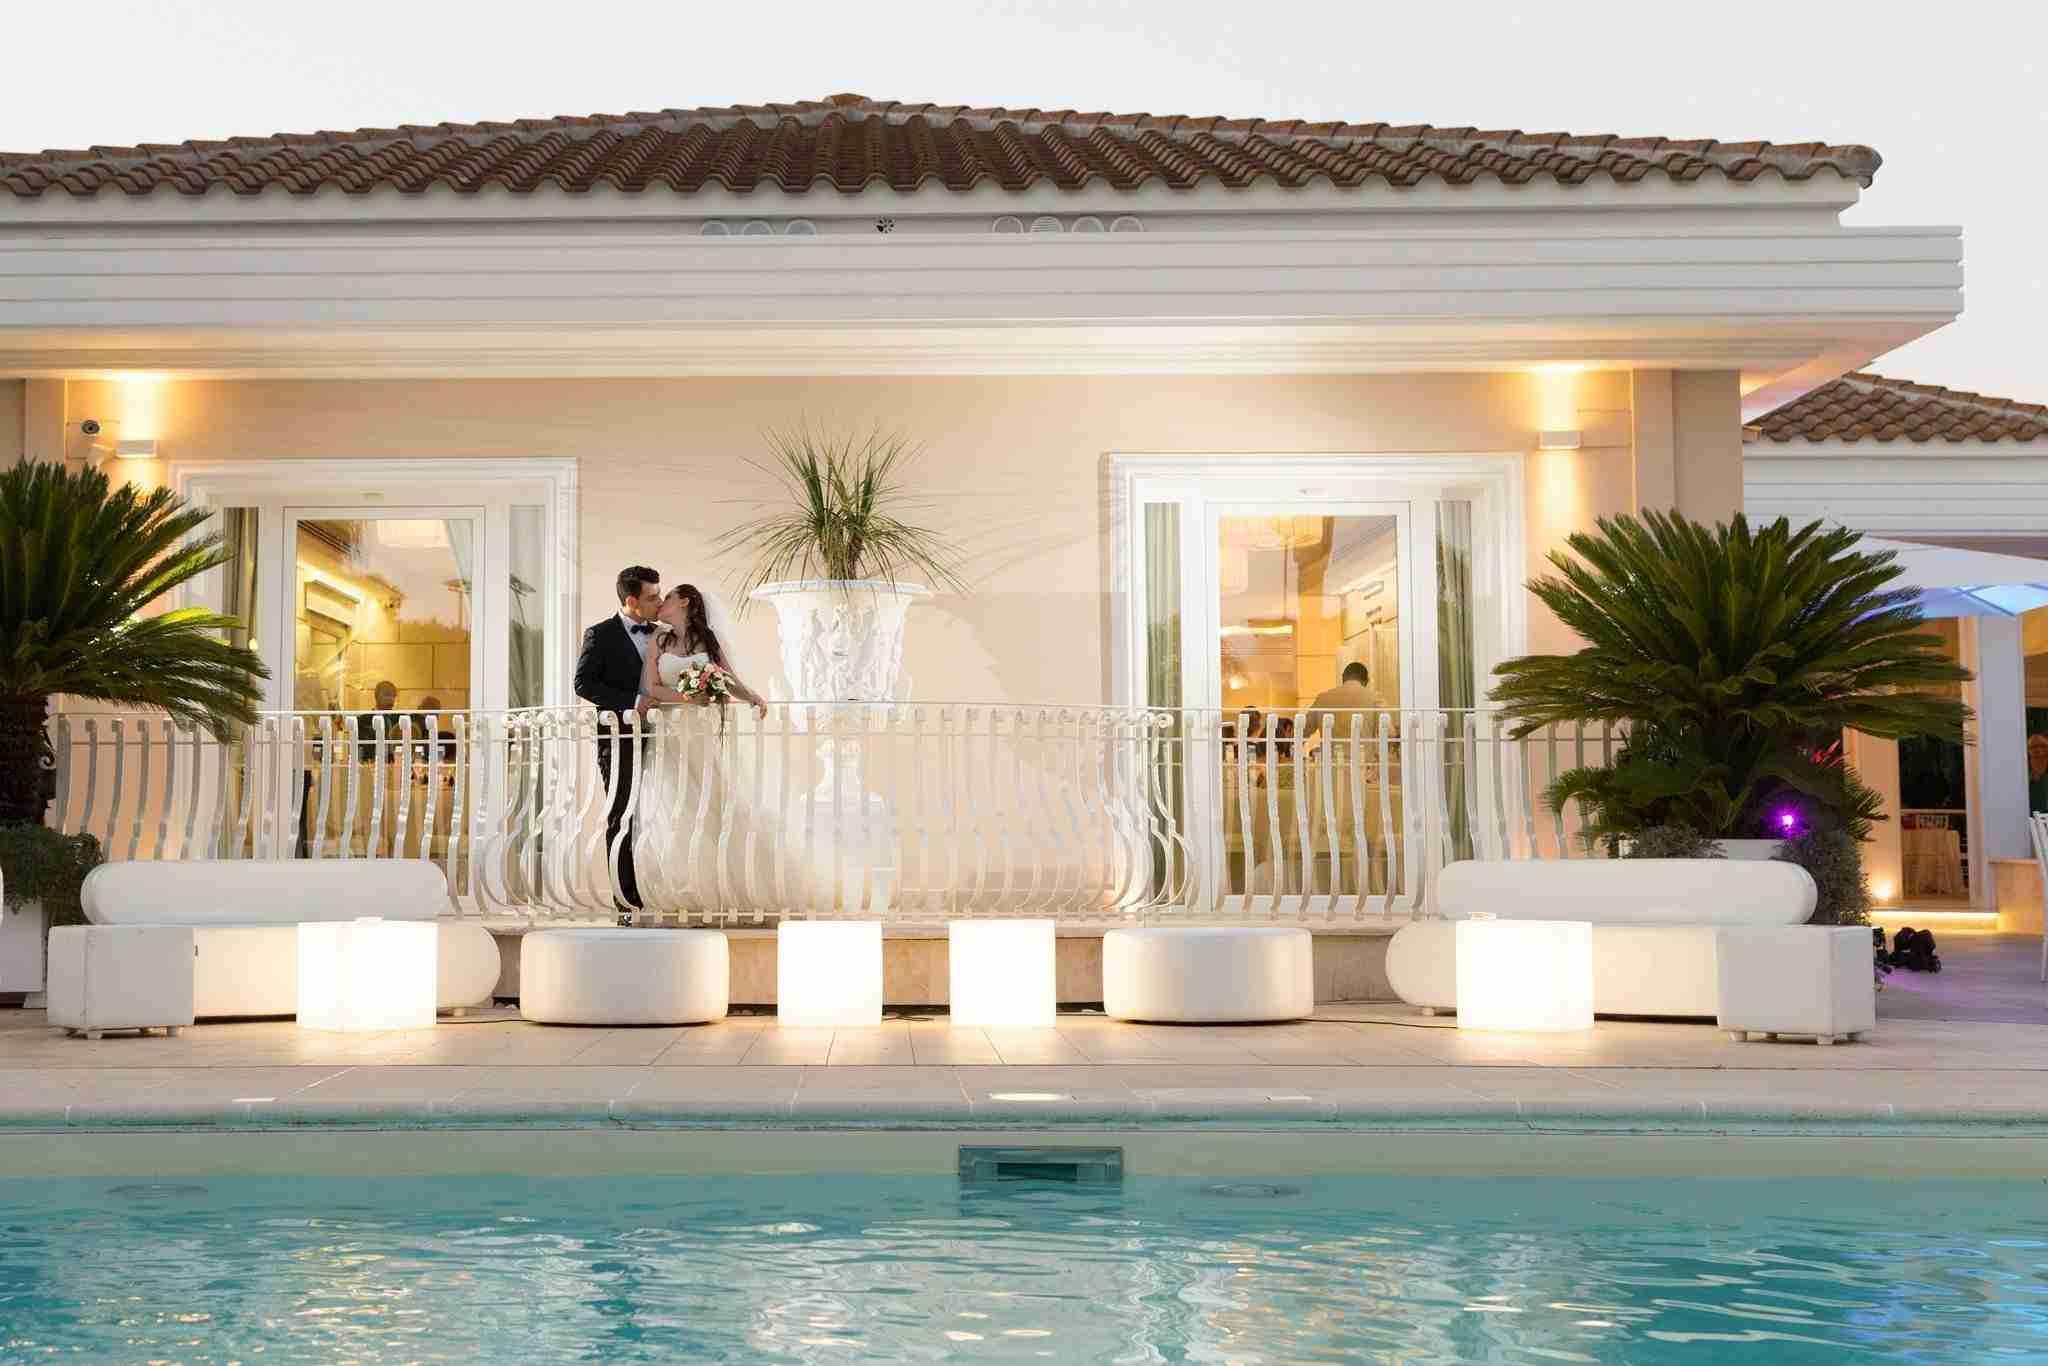 Villa Matrimonio con Piscina - Villa Demetra